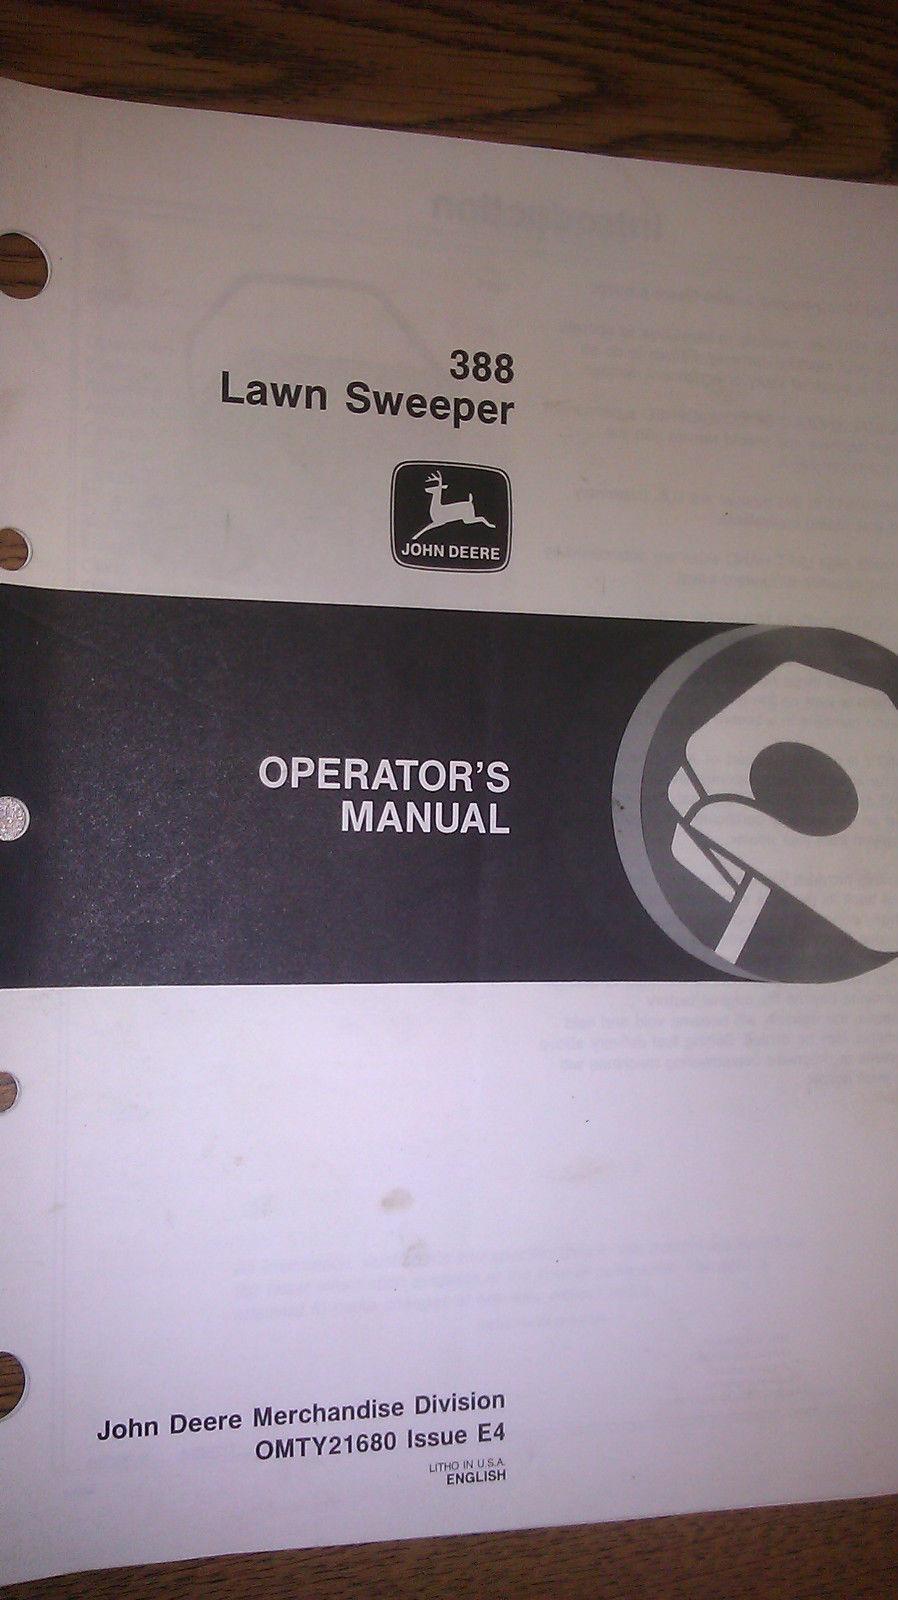 JOHN DEERE 388 LAWN SWEEPER OPERATOR`S MANUAL OMTY21680 E4